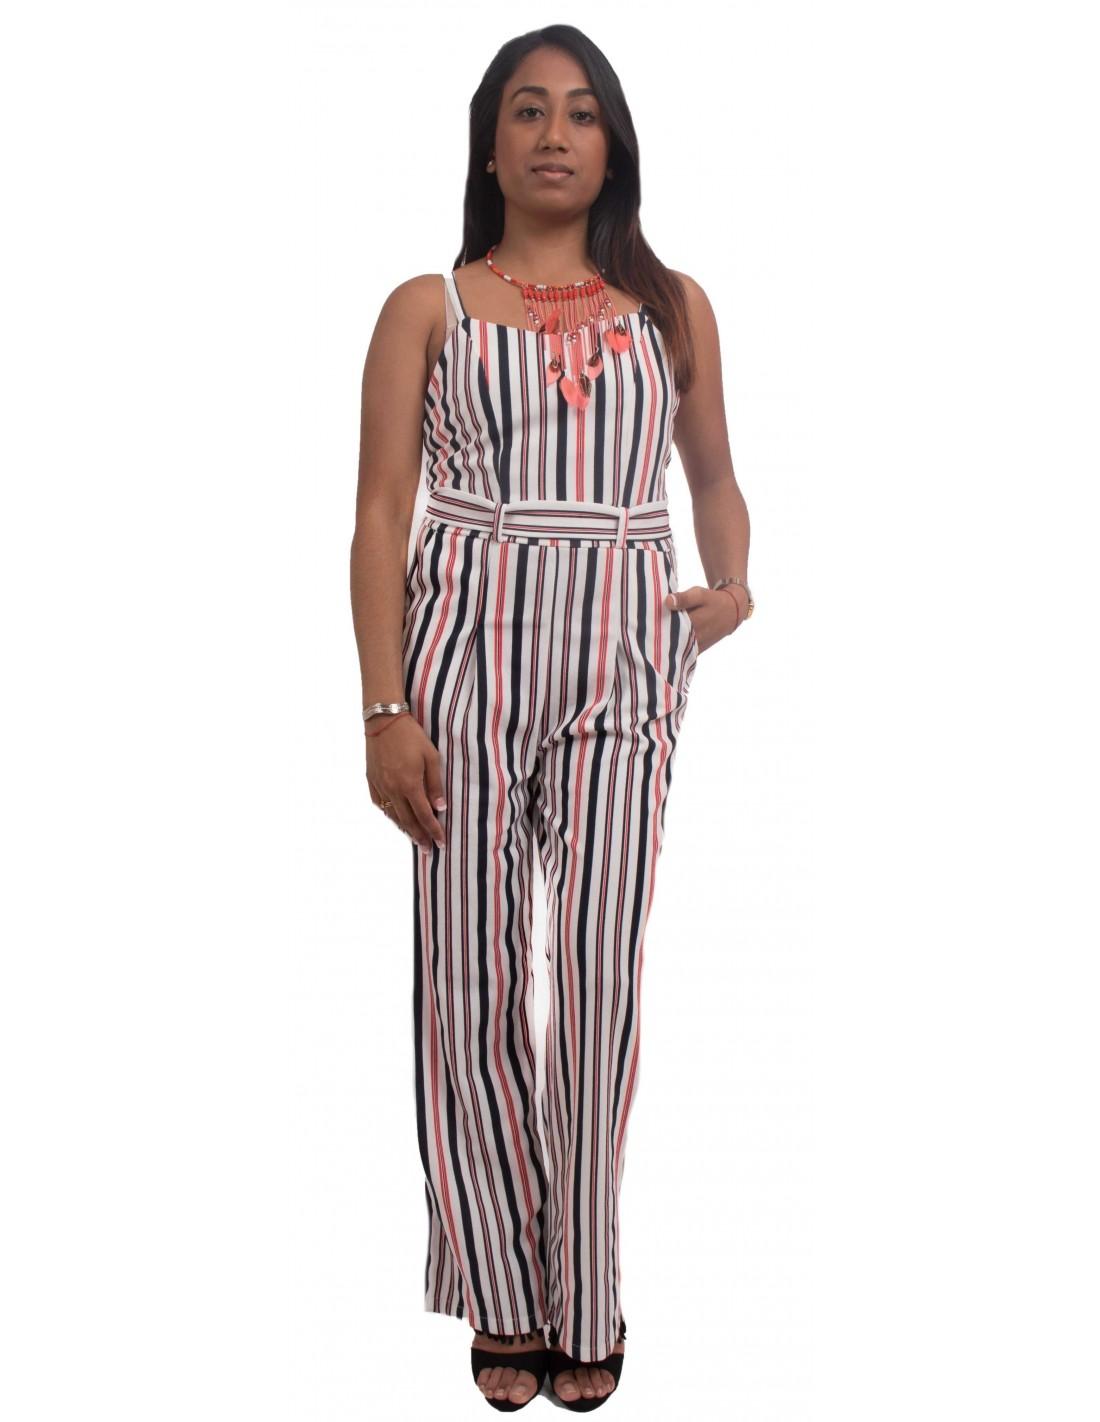 combinaison femme rayures type combinaison pantalon sexy d 39 t. Black Bedroom Furniture Sets. Home Design Ideas